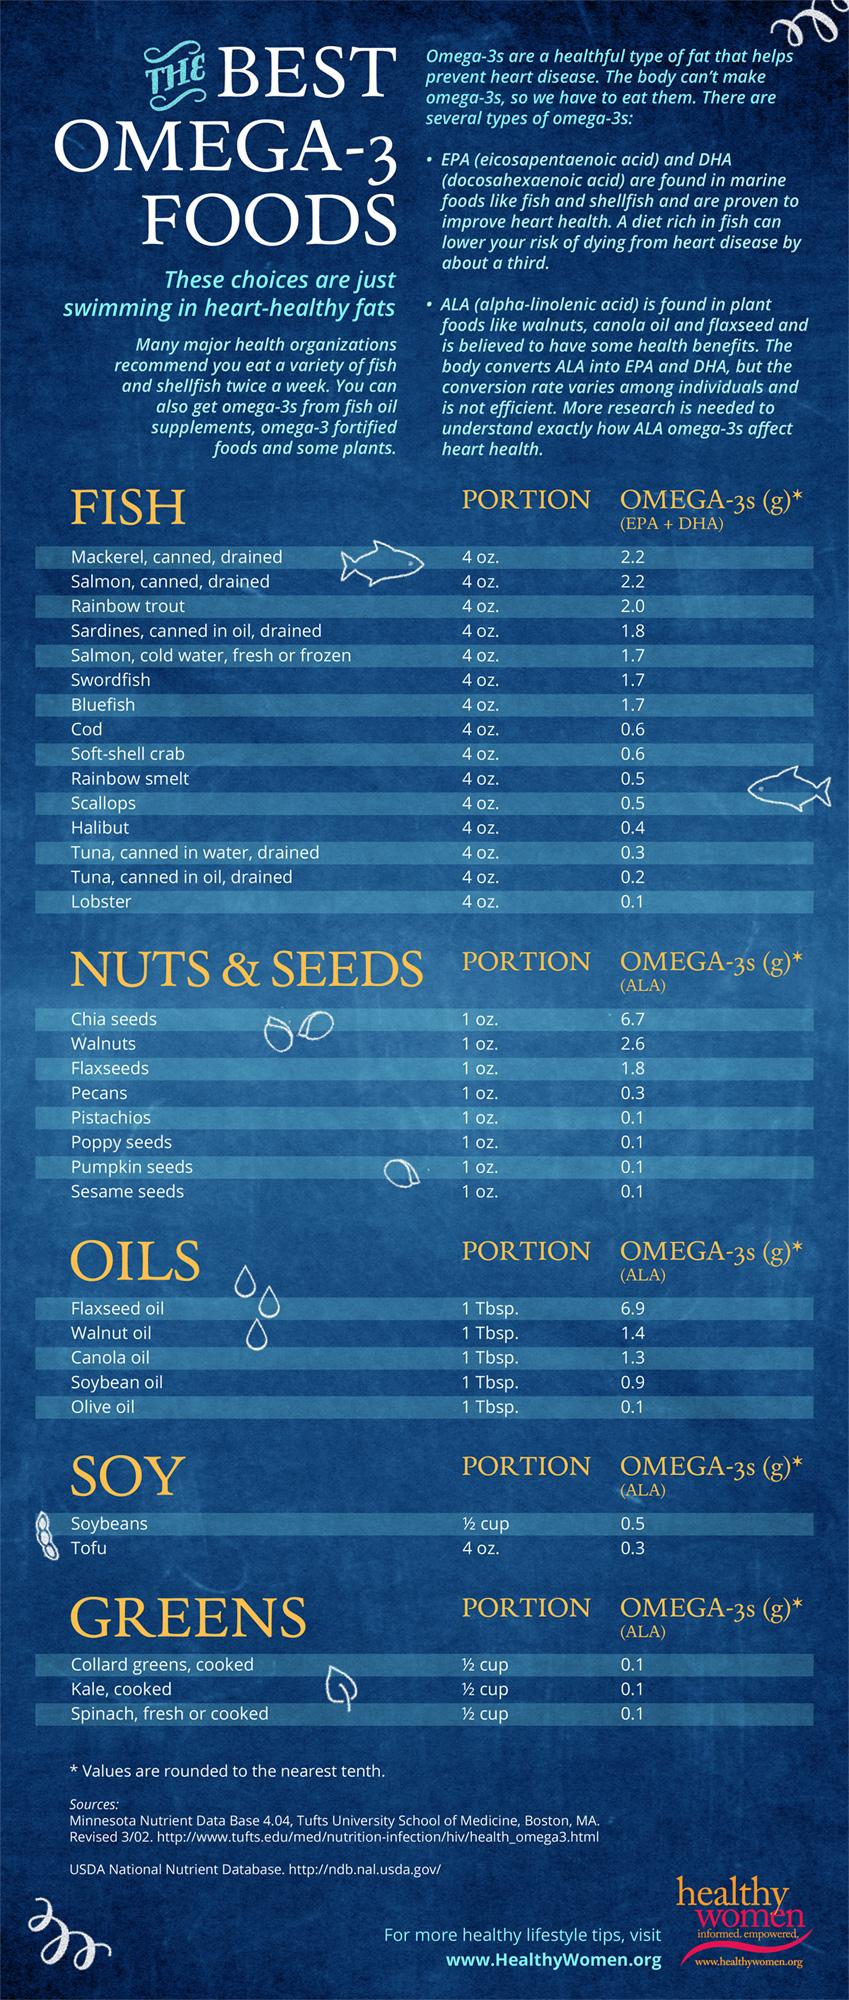 33 Full Of Omega-3 Foods Infographic